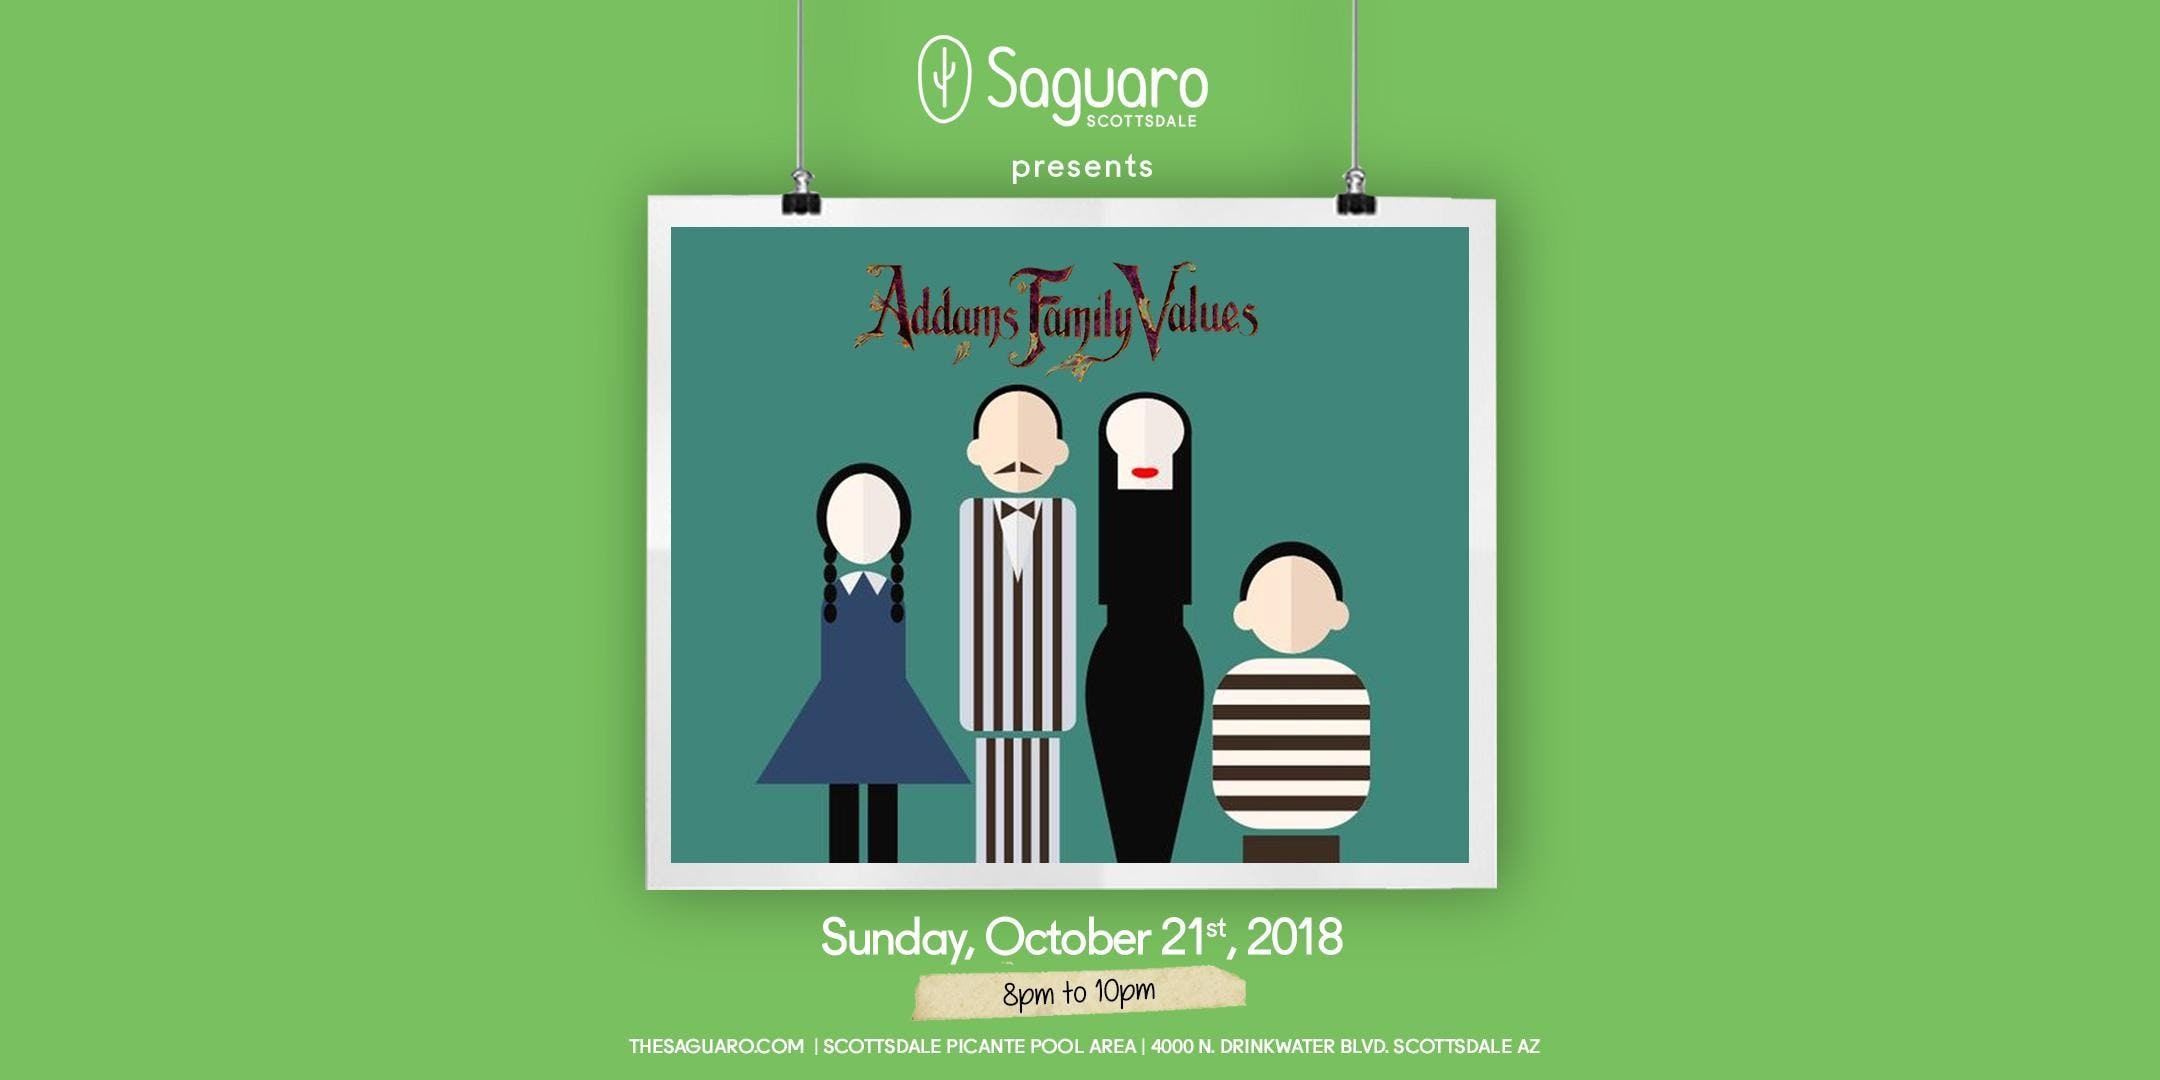 The Saguaro Scottsdale screening of 'Addams Family Values'